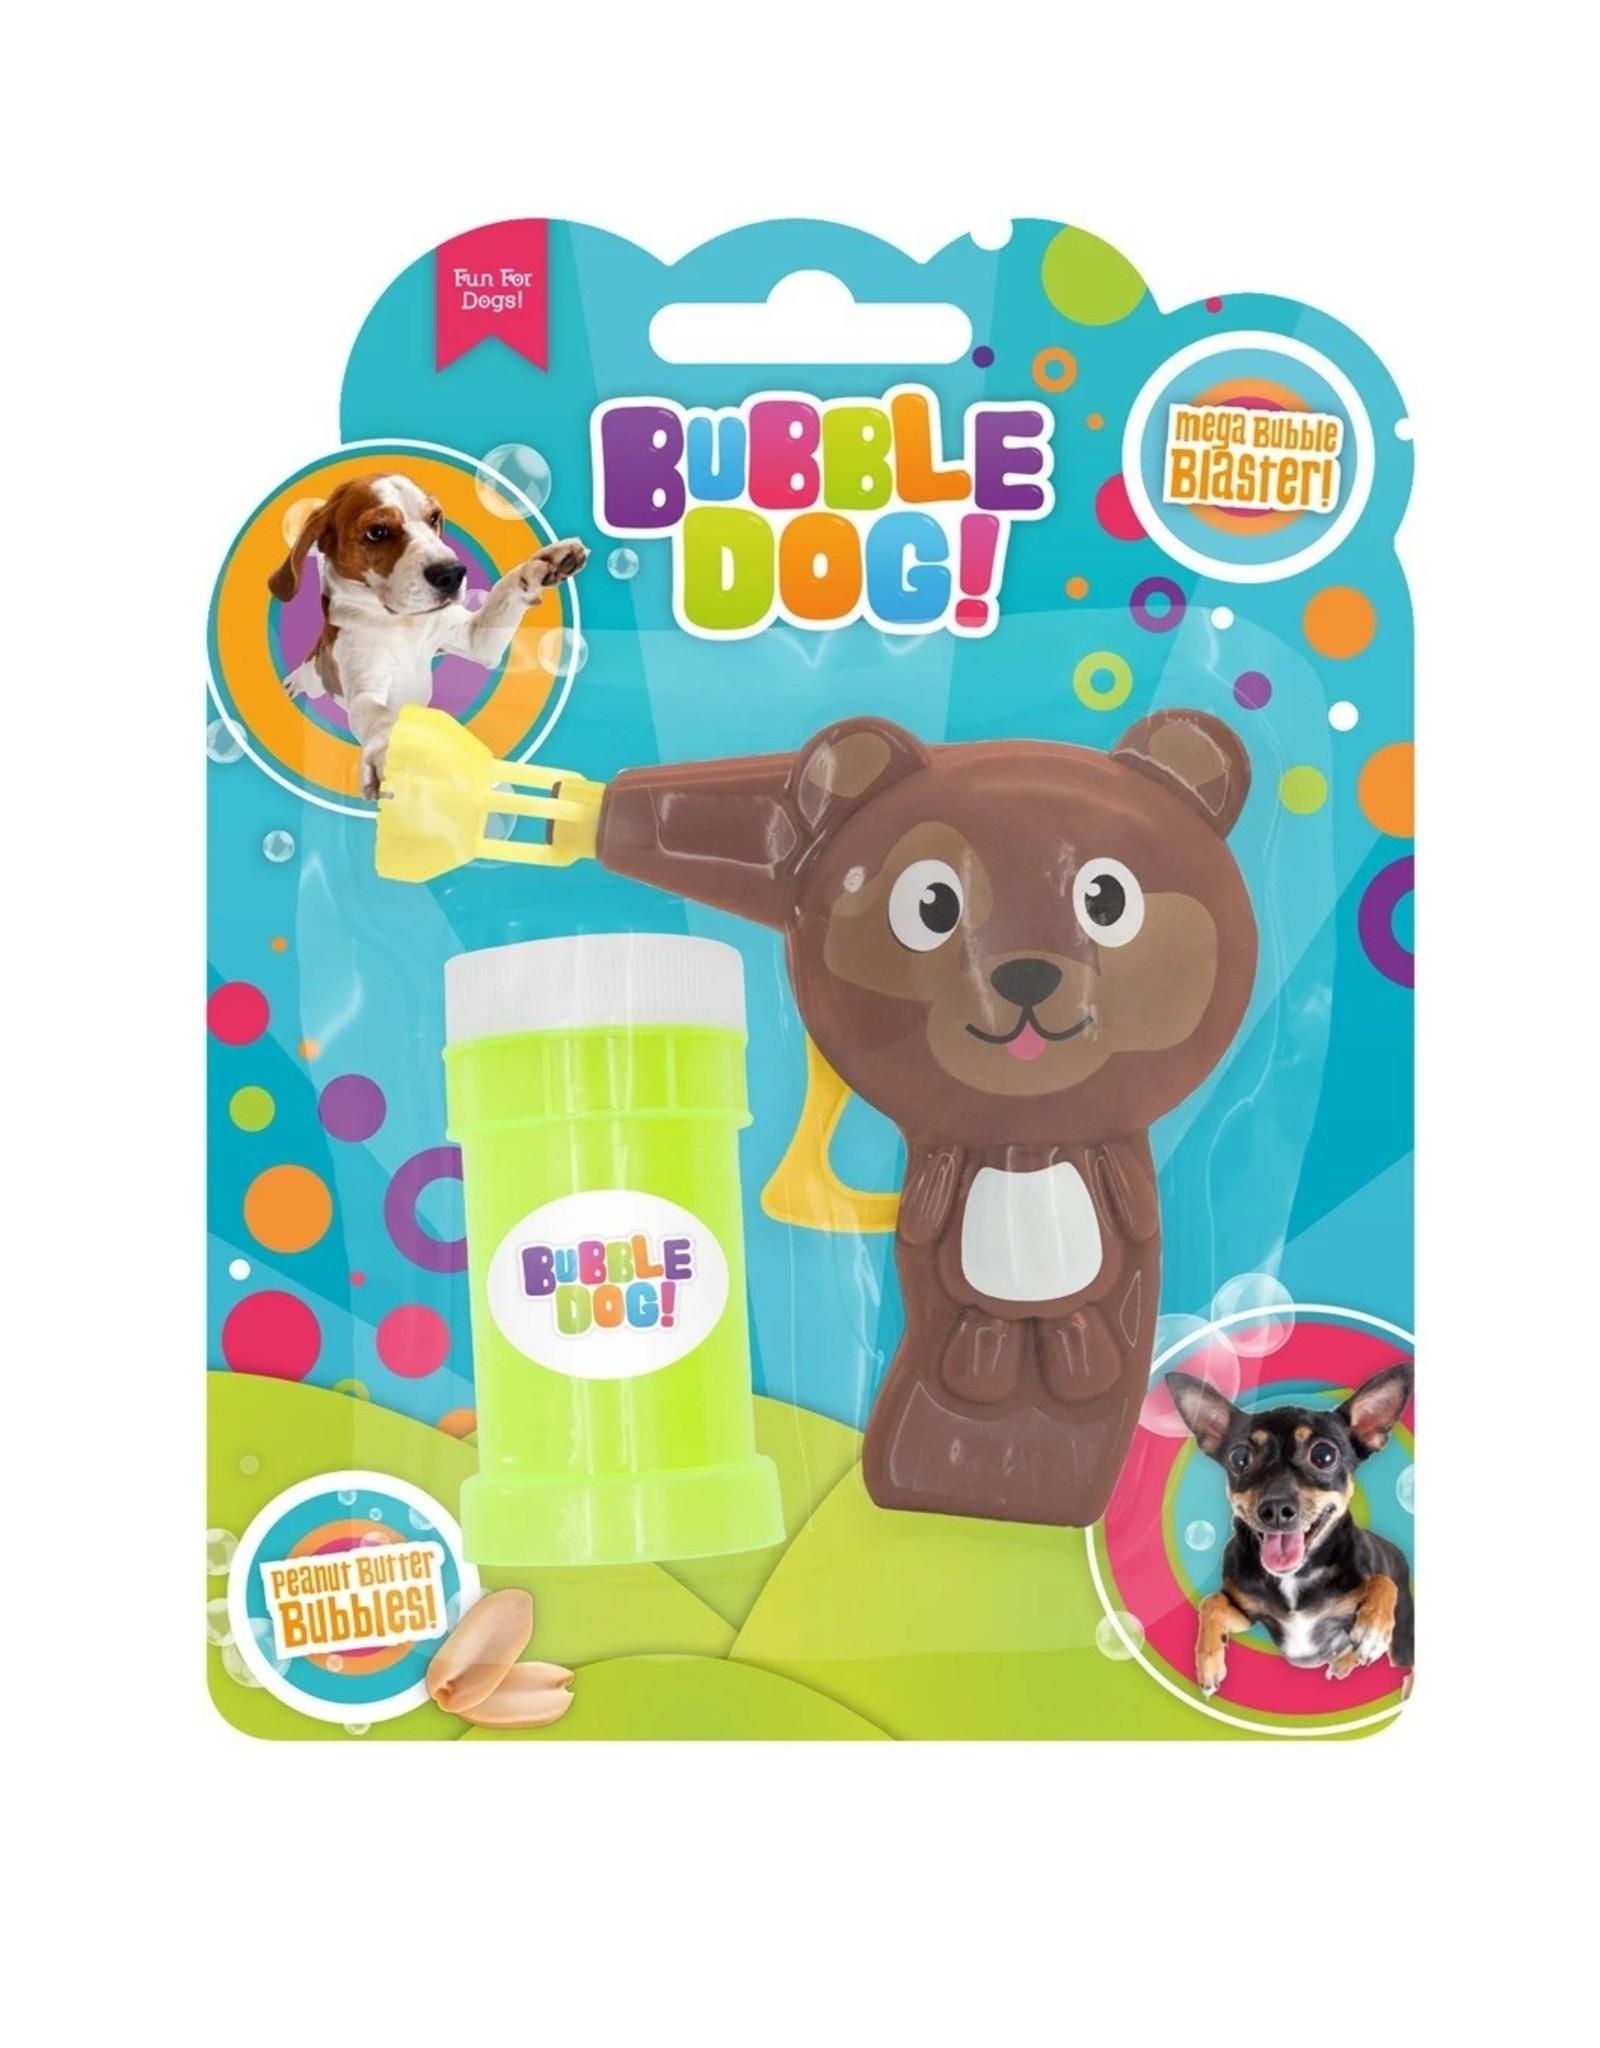 Bubble Dog Manual Bubble Gun, Peanut Butter